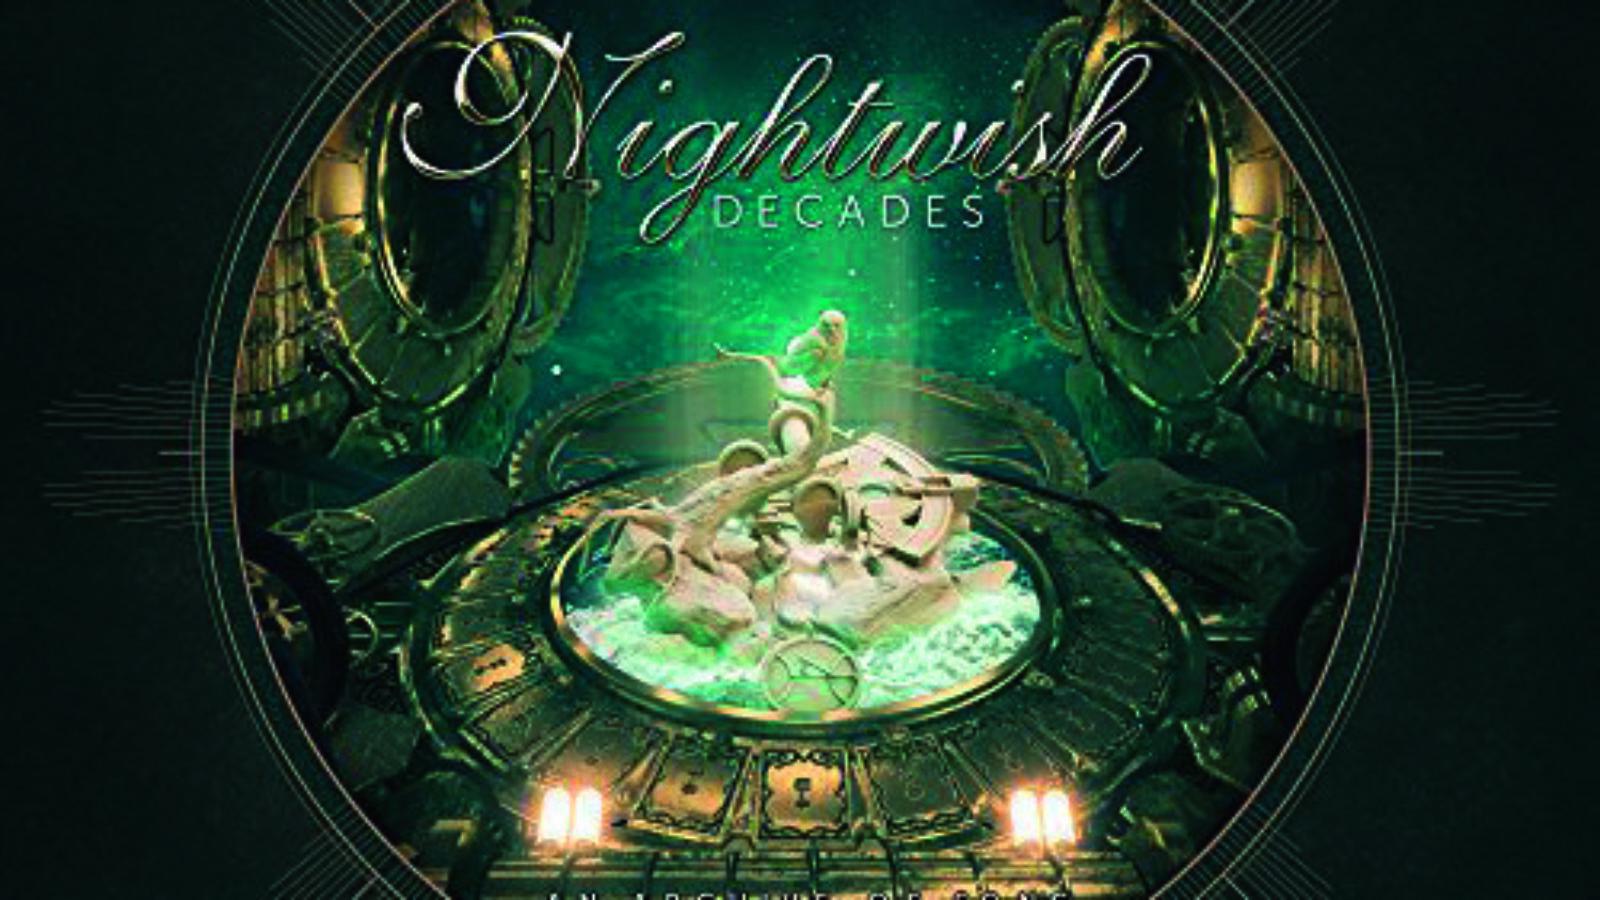 Nightwish Decades